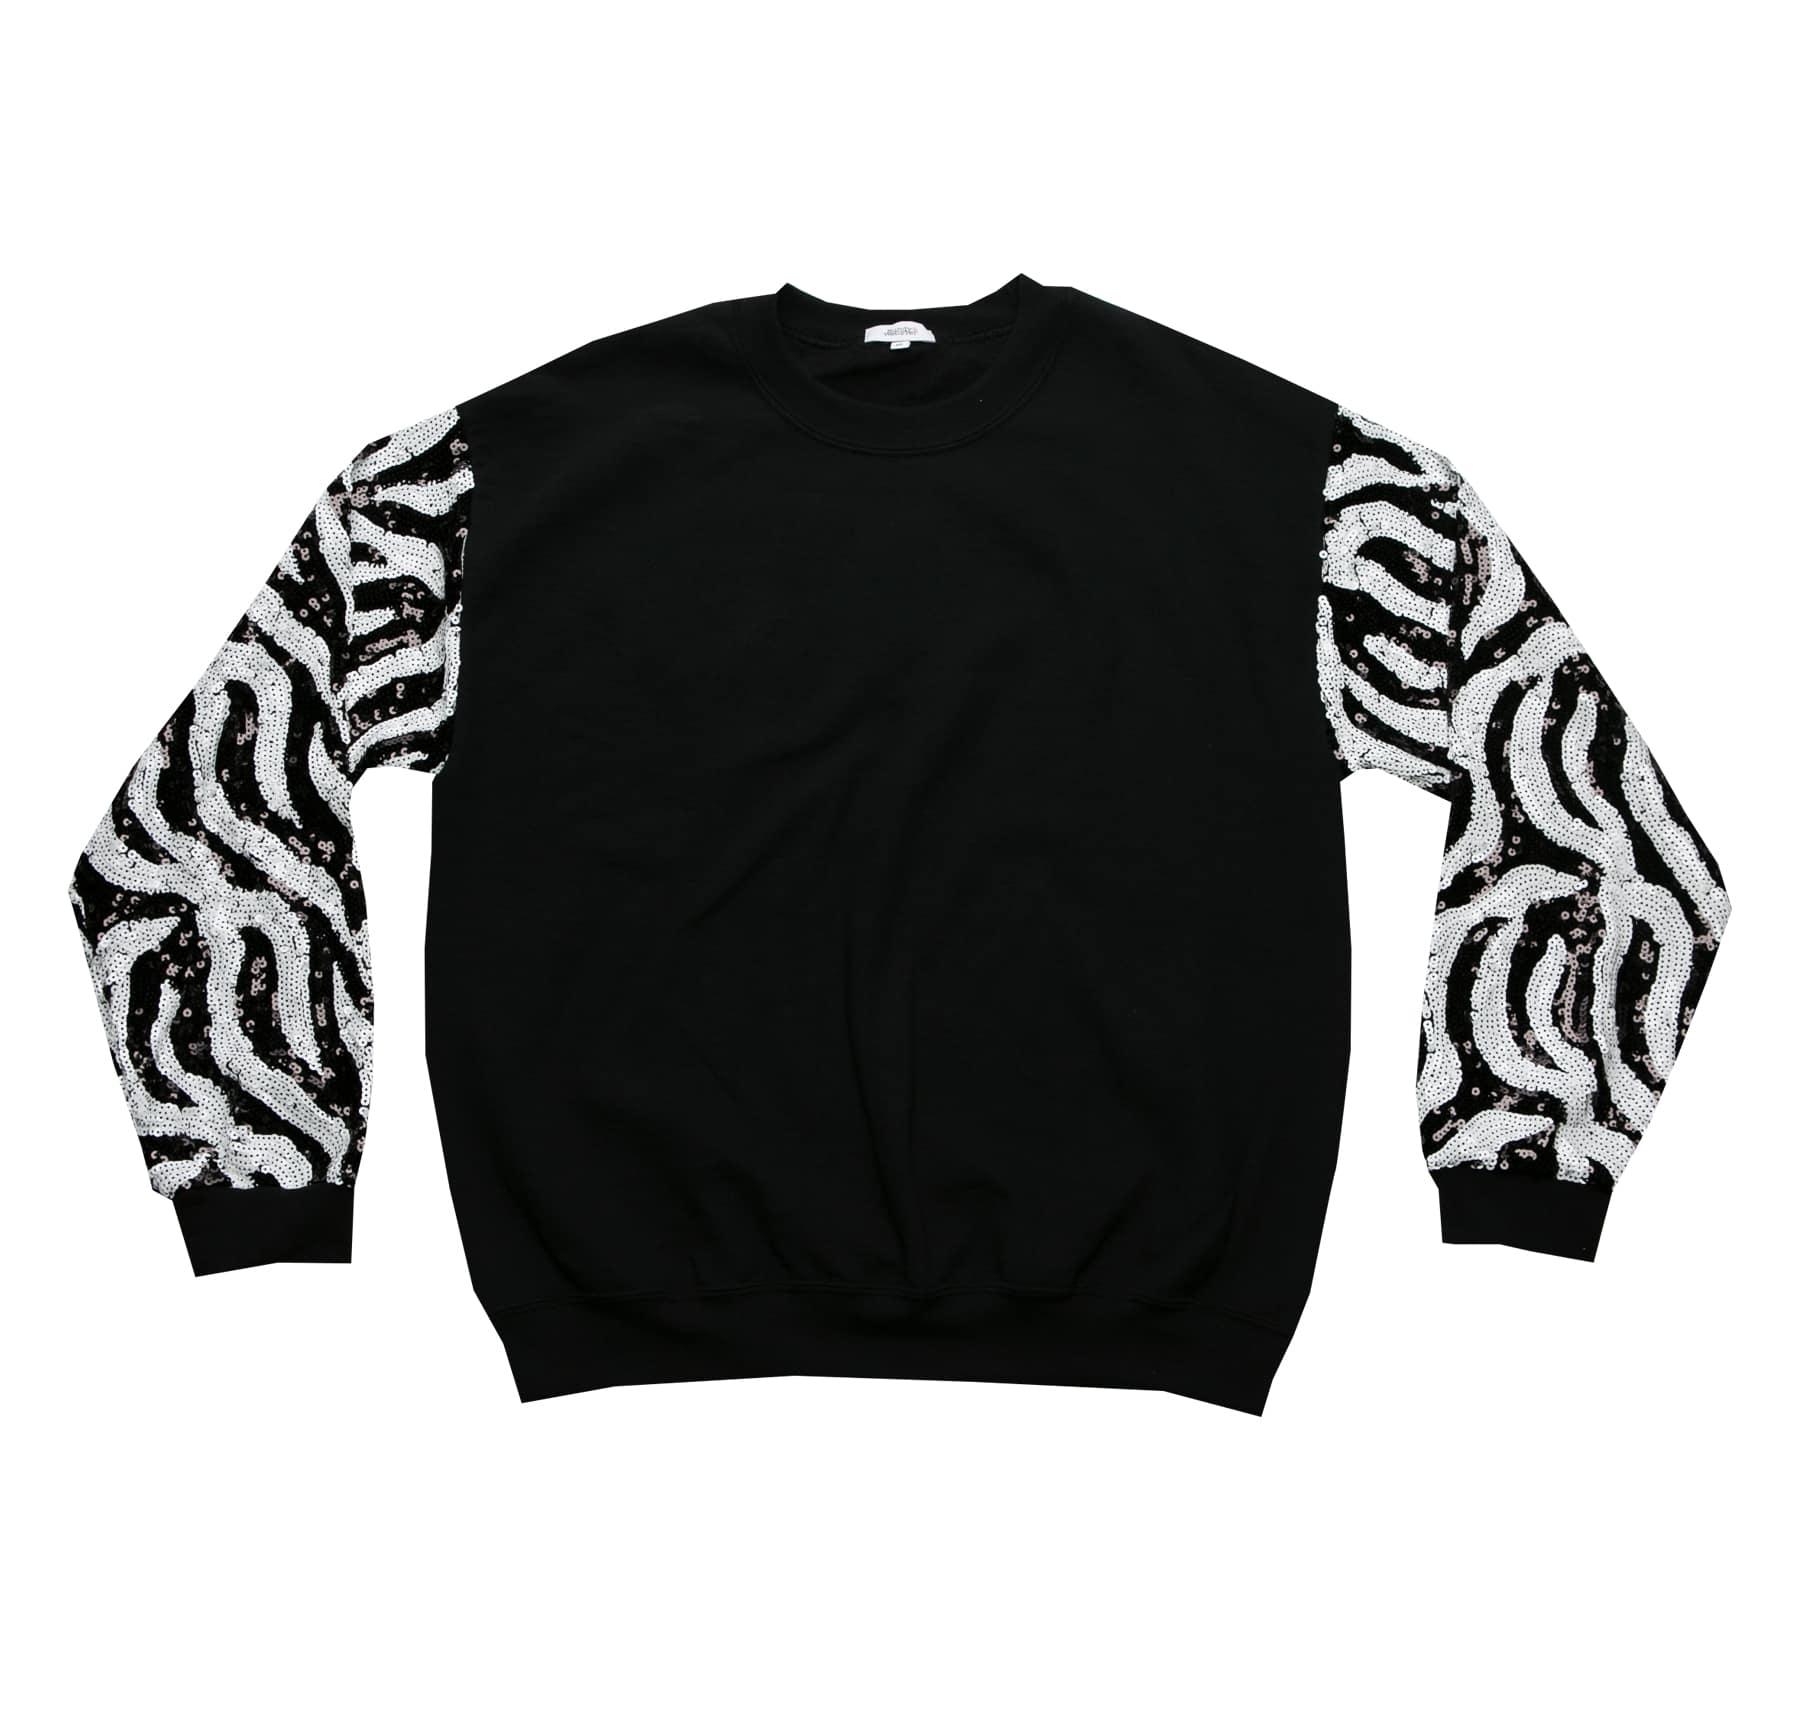 374330955b4 Zebra Sequin Sweater image